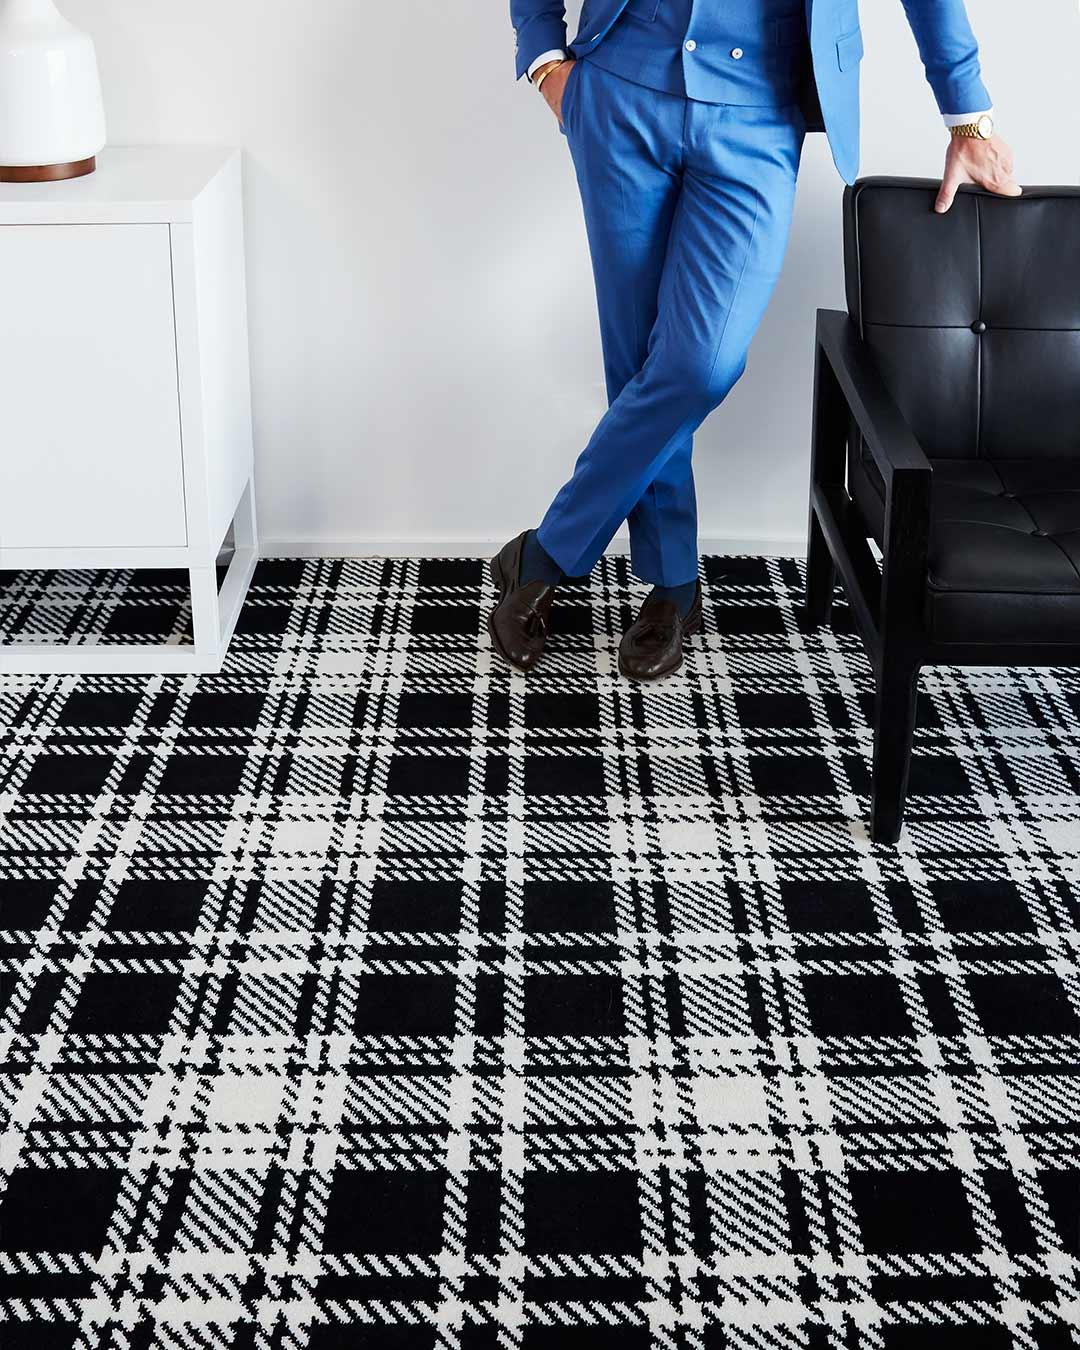 Image of Kintore black and white tartan Axminster carpet